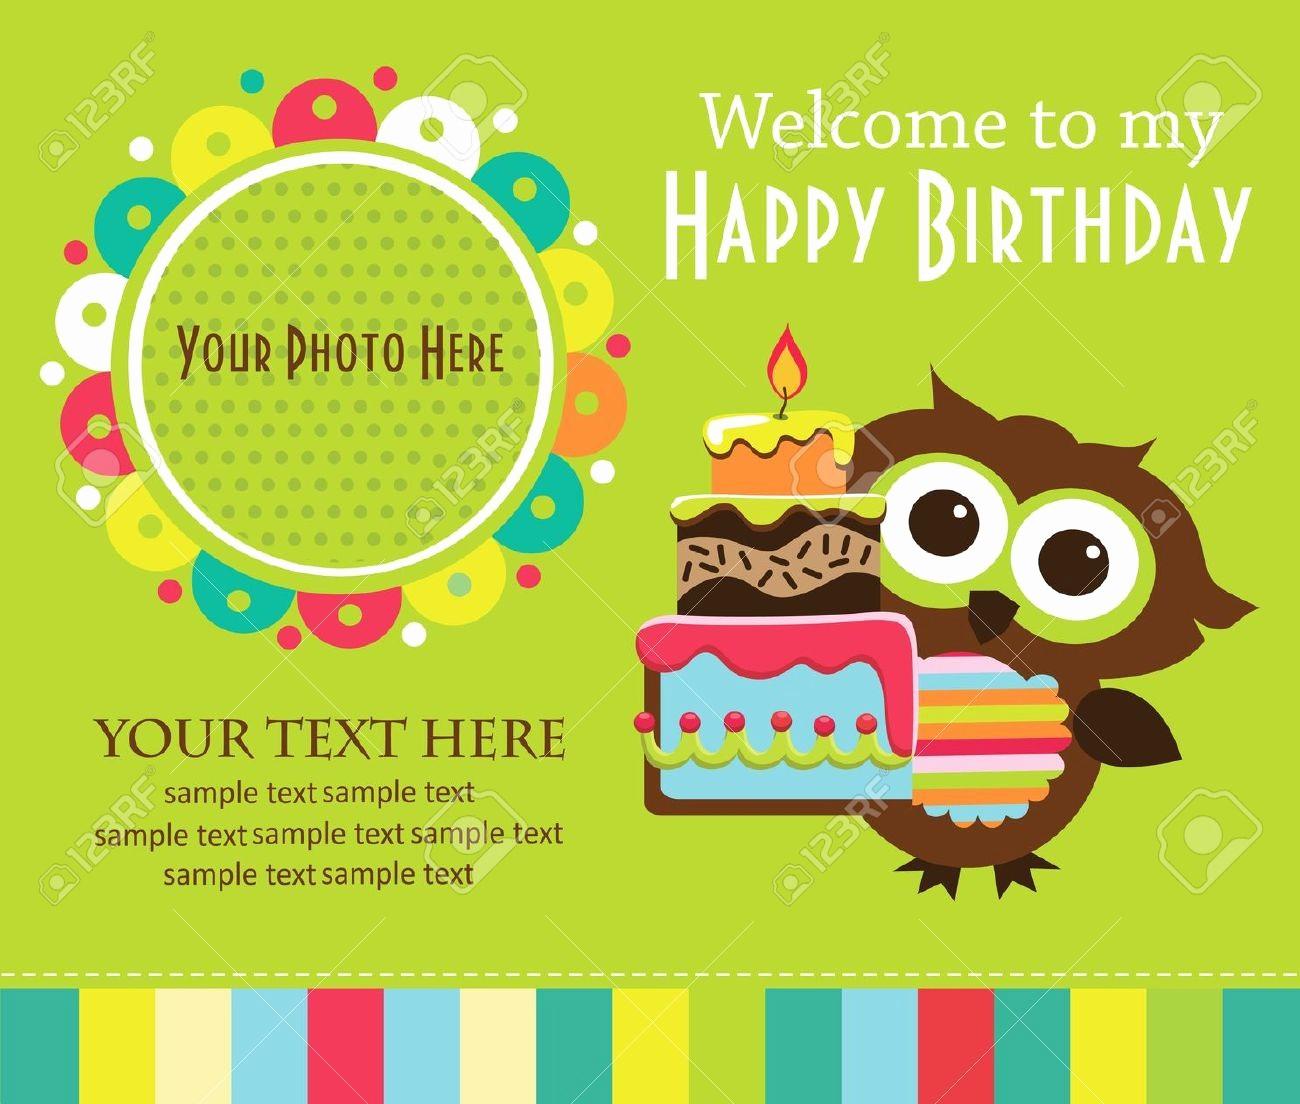 Kids Birthday Party Invite Templates Fresh Birthday Invitation Card Template for Kids